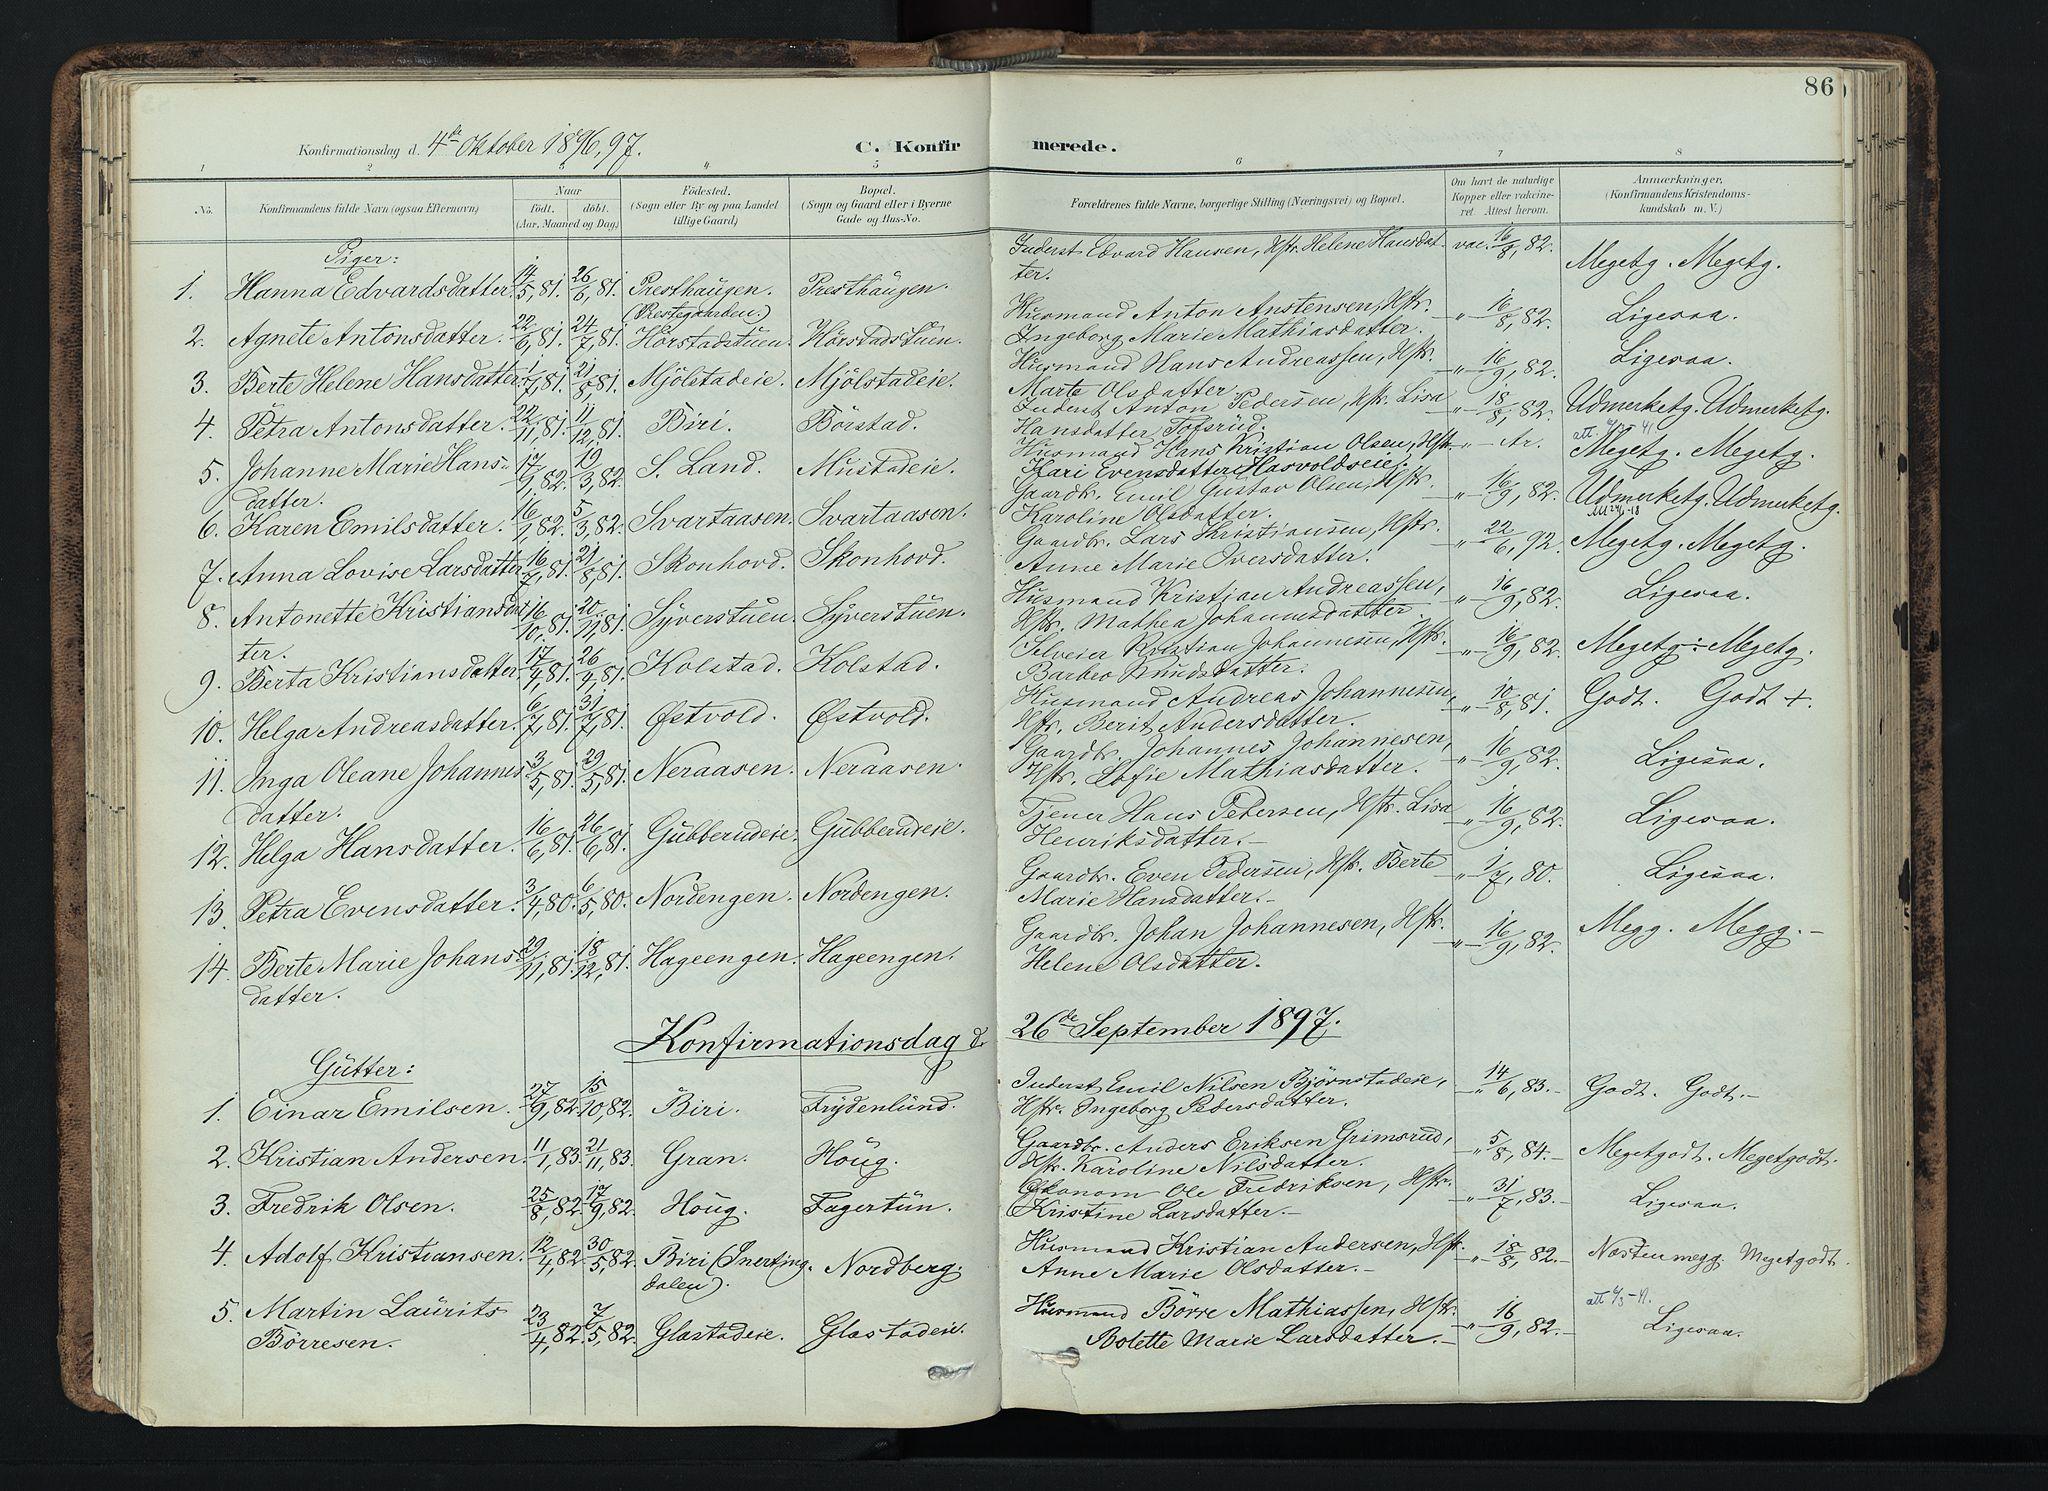 SAH, Vardal prestekontor, H/Ha/Haa/L0019: Ministerialbok nr. 19, 1893-1907, s. 86